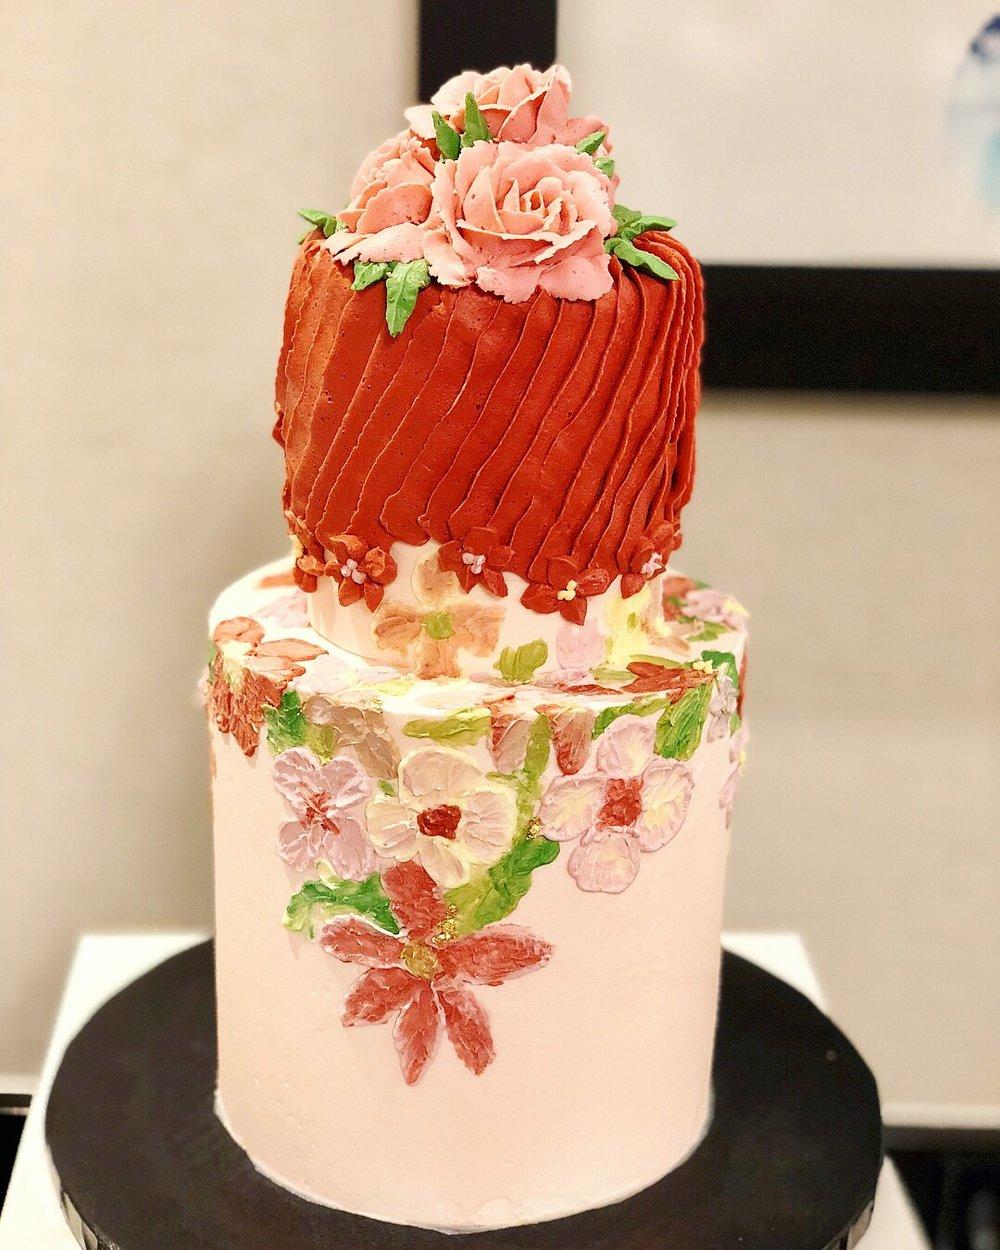 Soflo cake.JPG